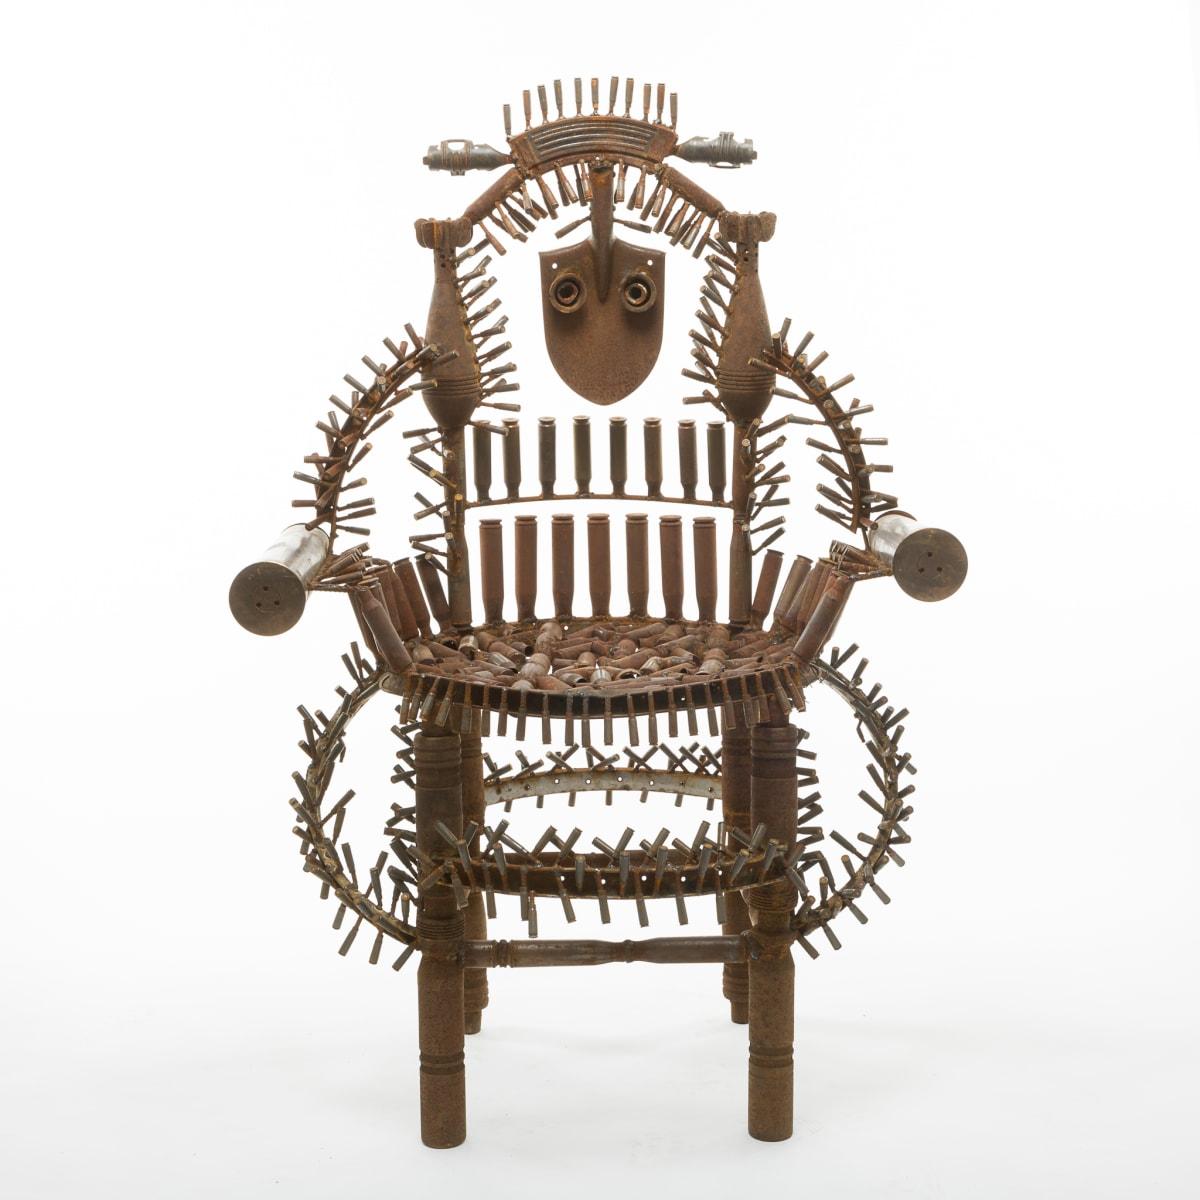 Goncalo Mabunda, The Throne of the World, 2016